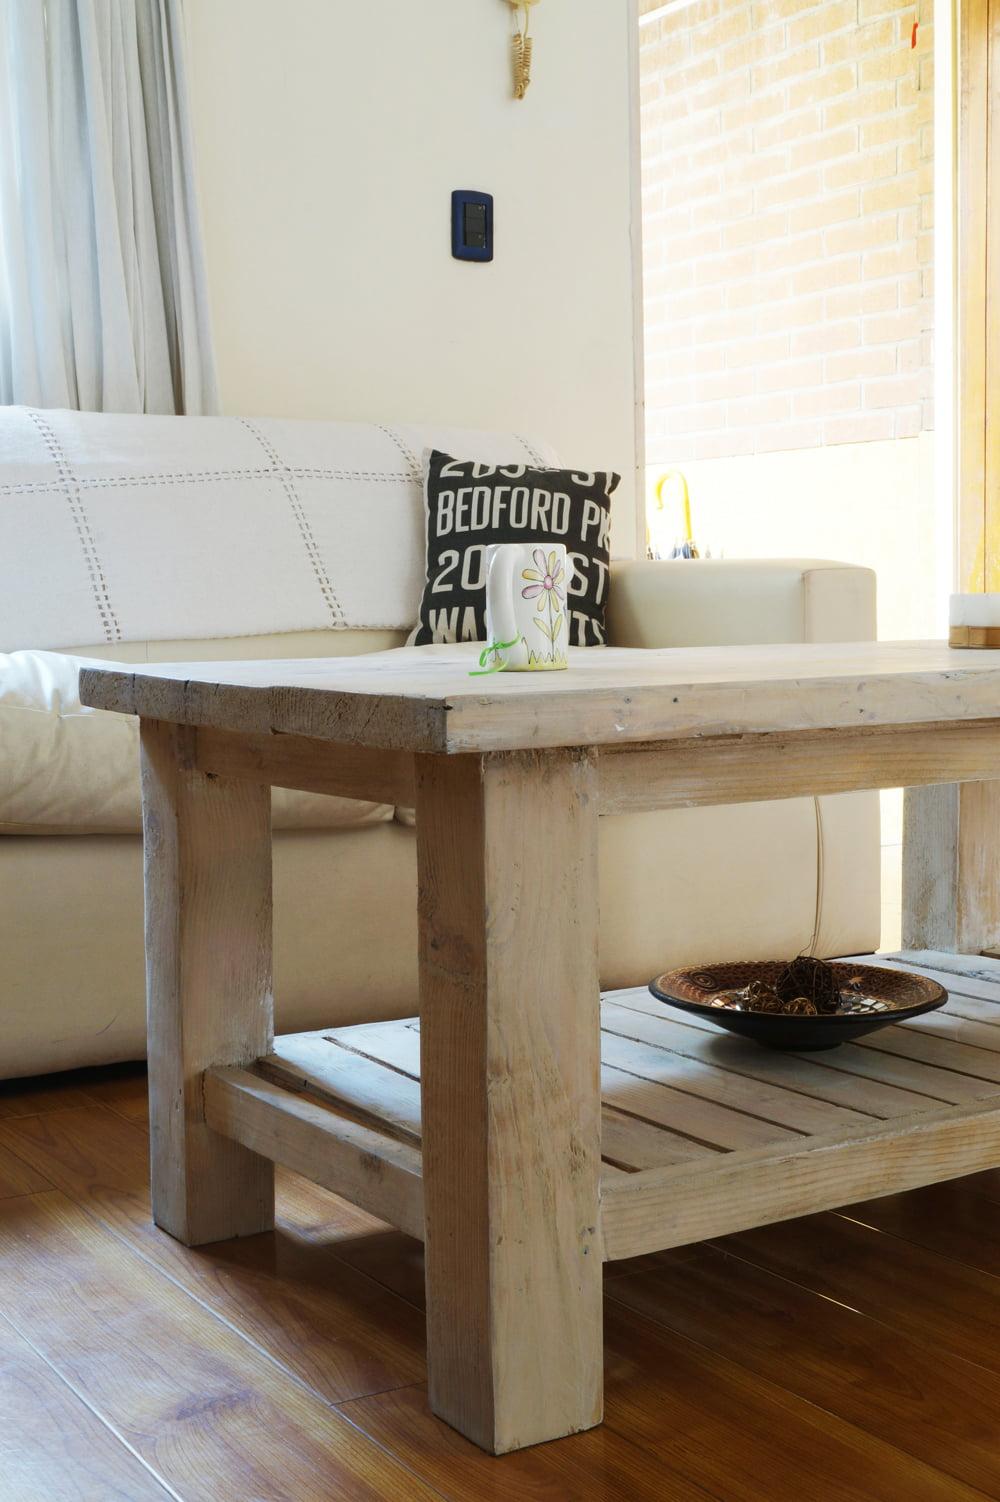 Mesa ratona deck antigua madera - Patas torneadas de madera ...